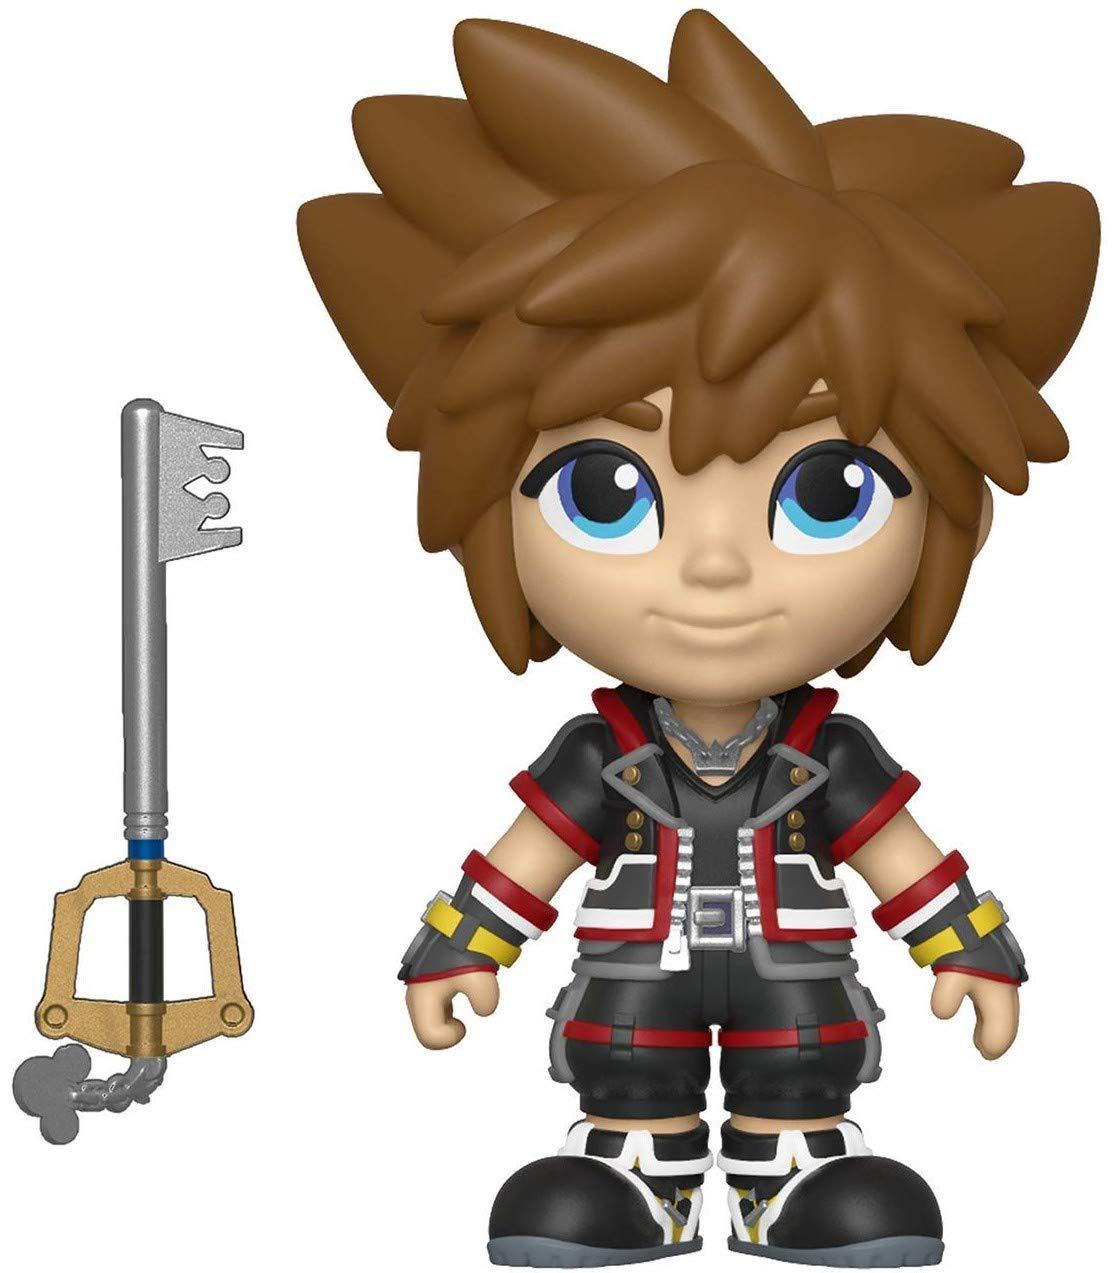 Kingdom Hearts 3 Sora Action Figure Funko 5 Star Disney Includes Compatible Pop Box Protector Case